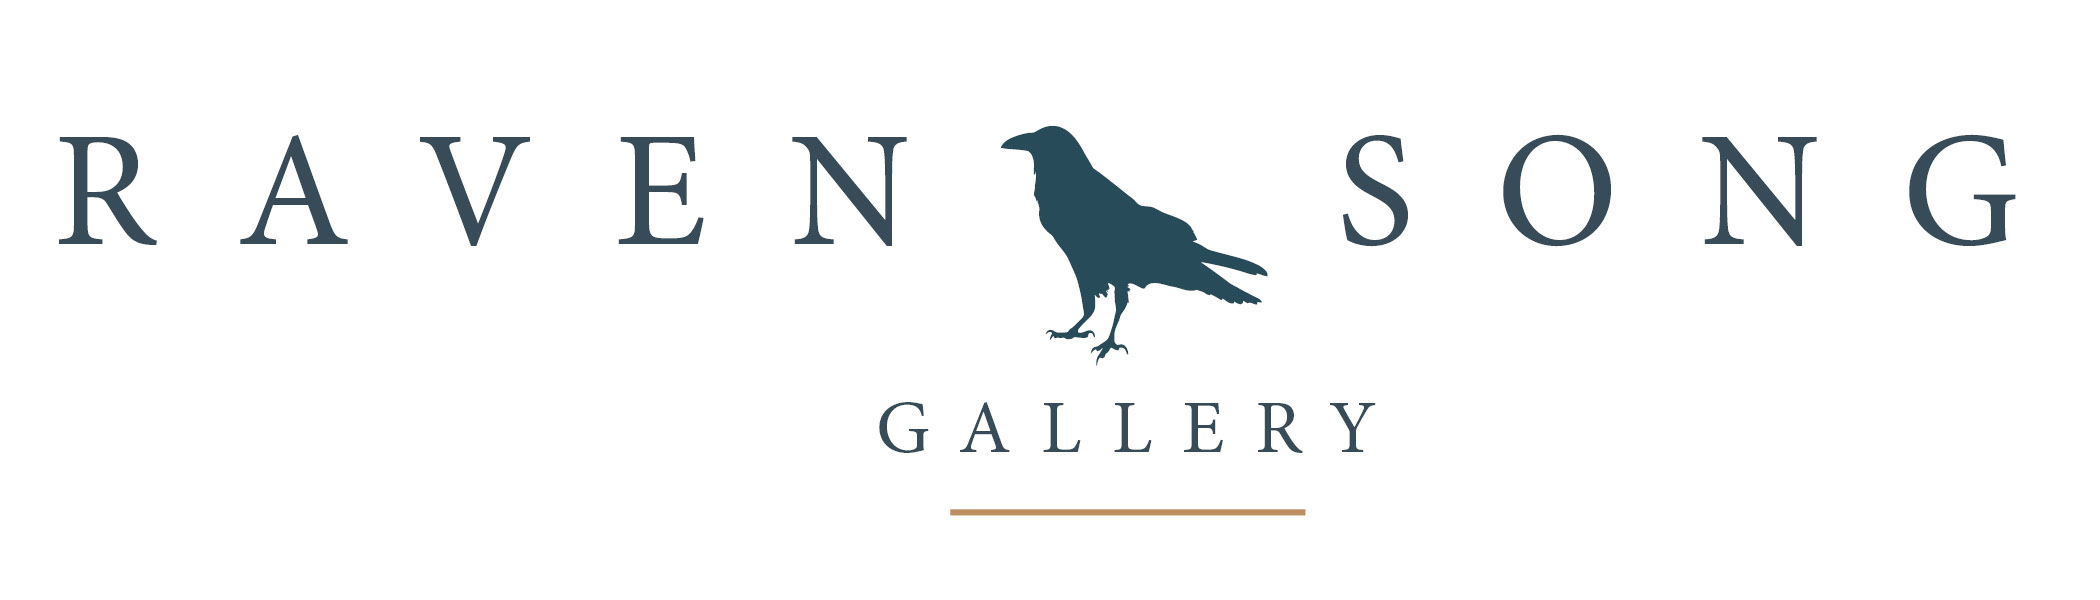 Raven Song Gallery Logo.jpg